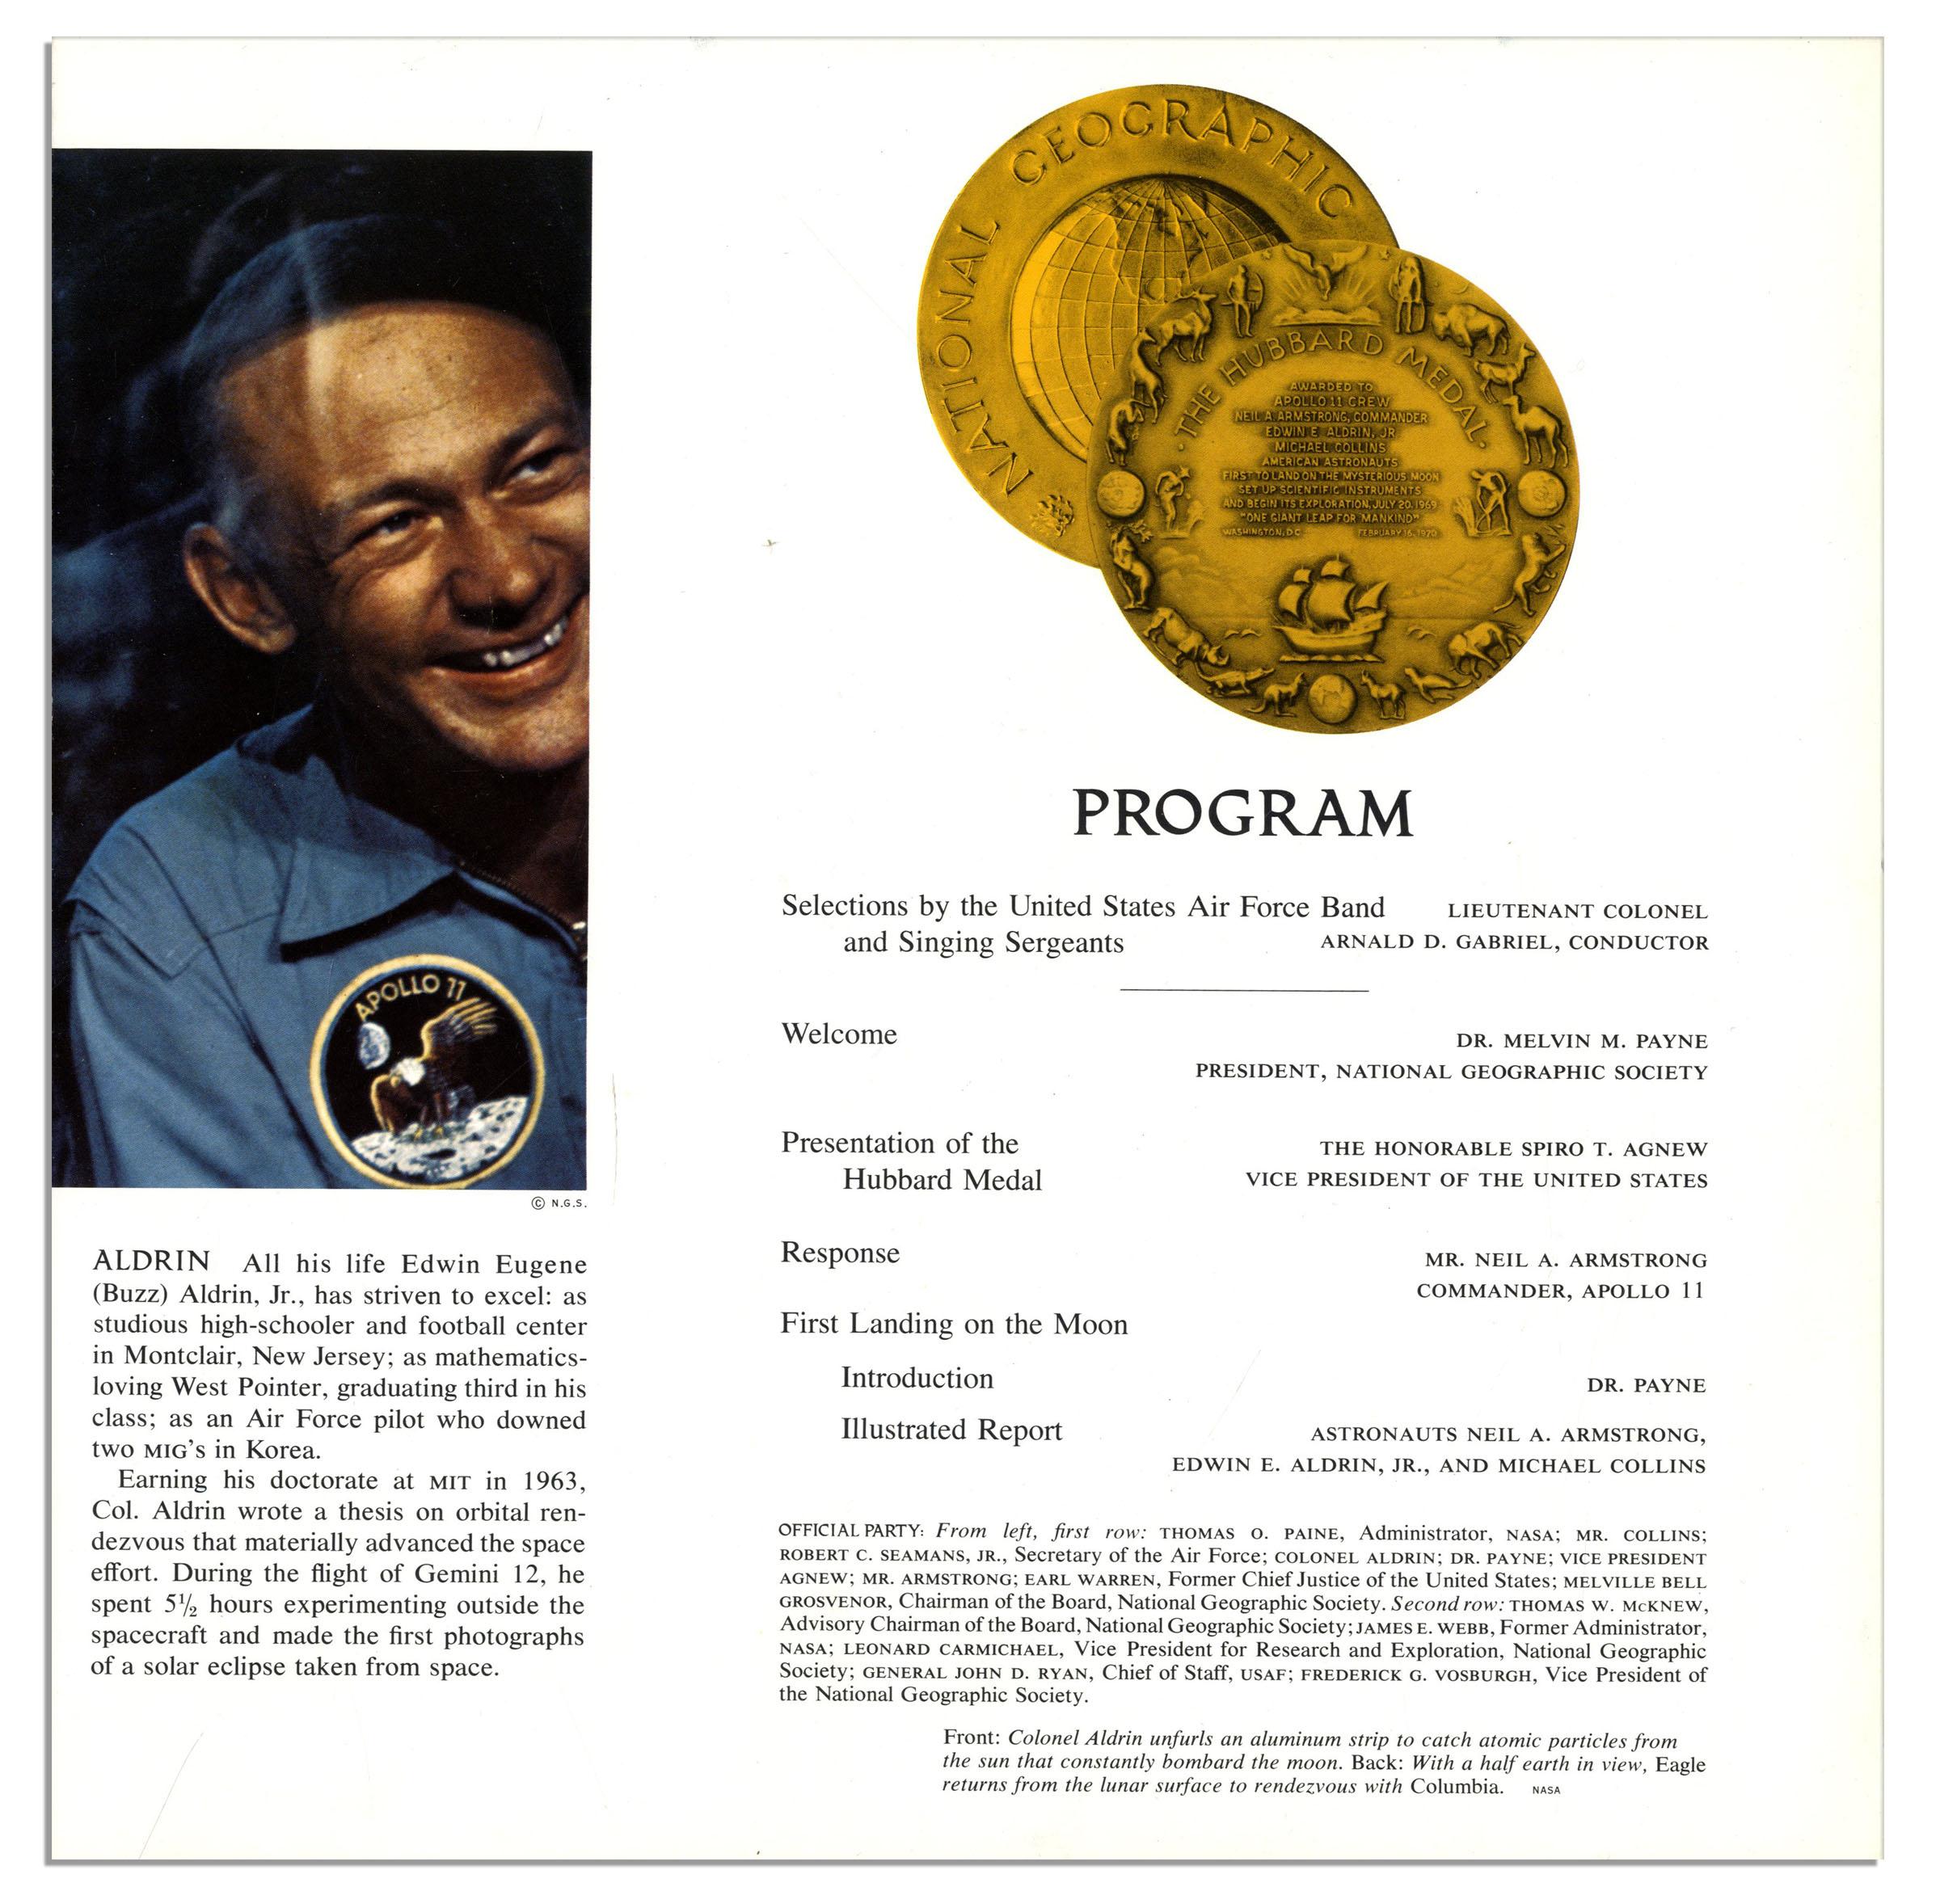 neil armstrong astronaut program - photo #32